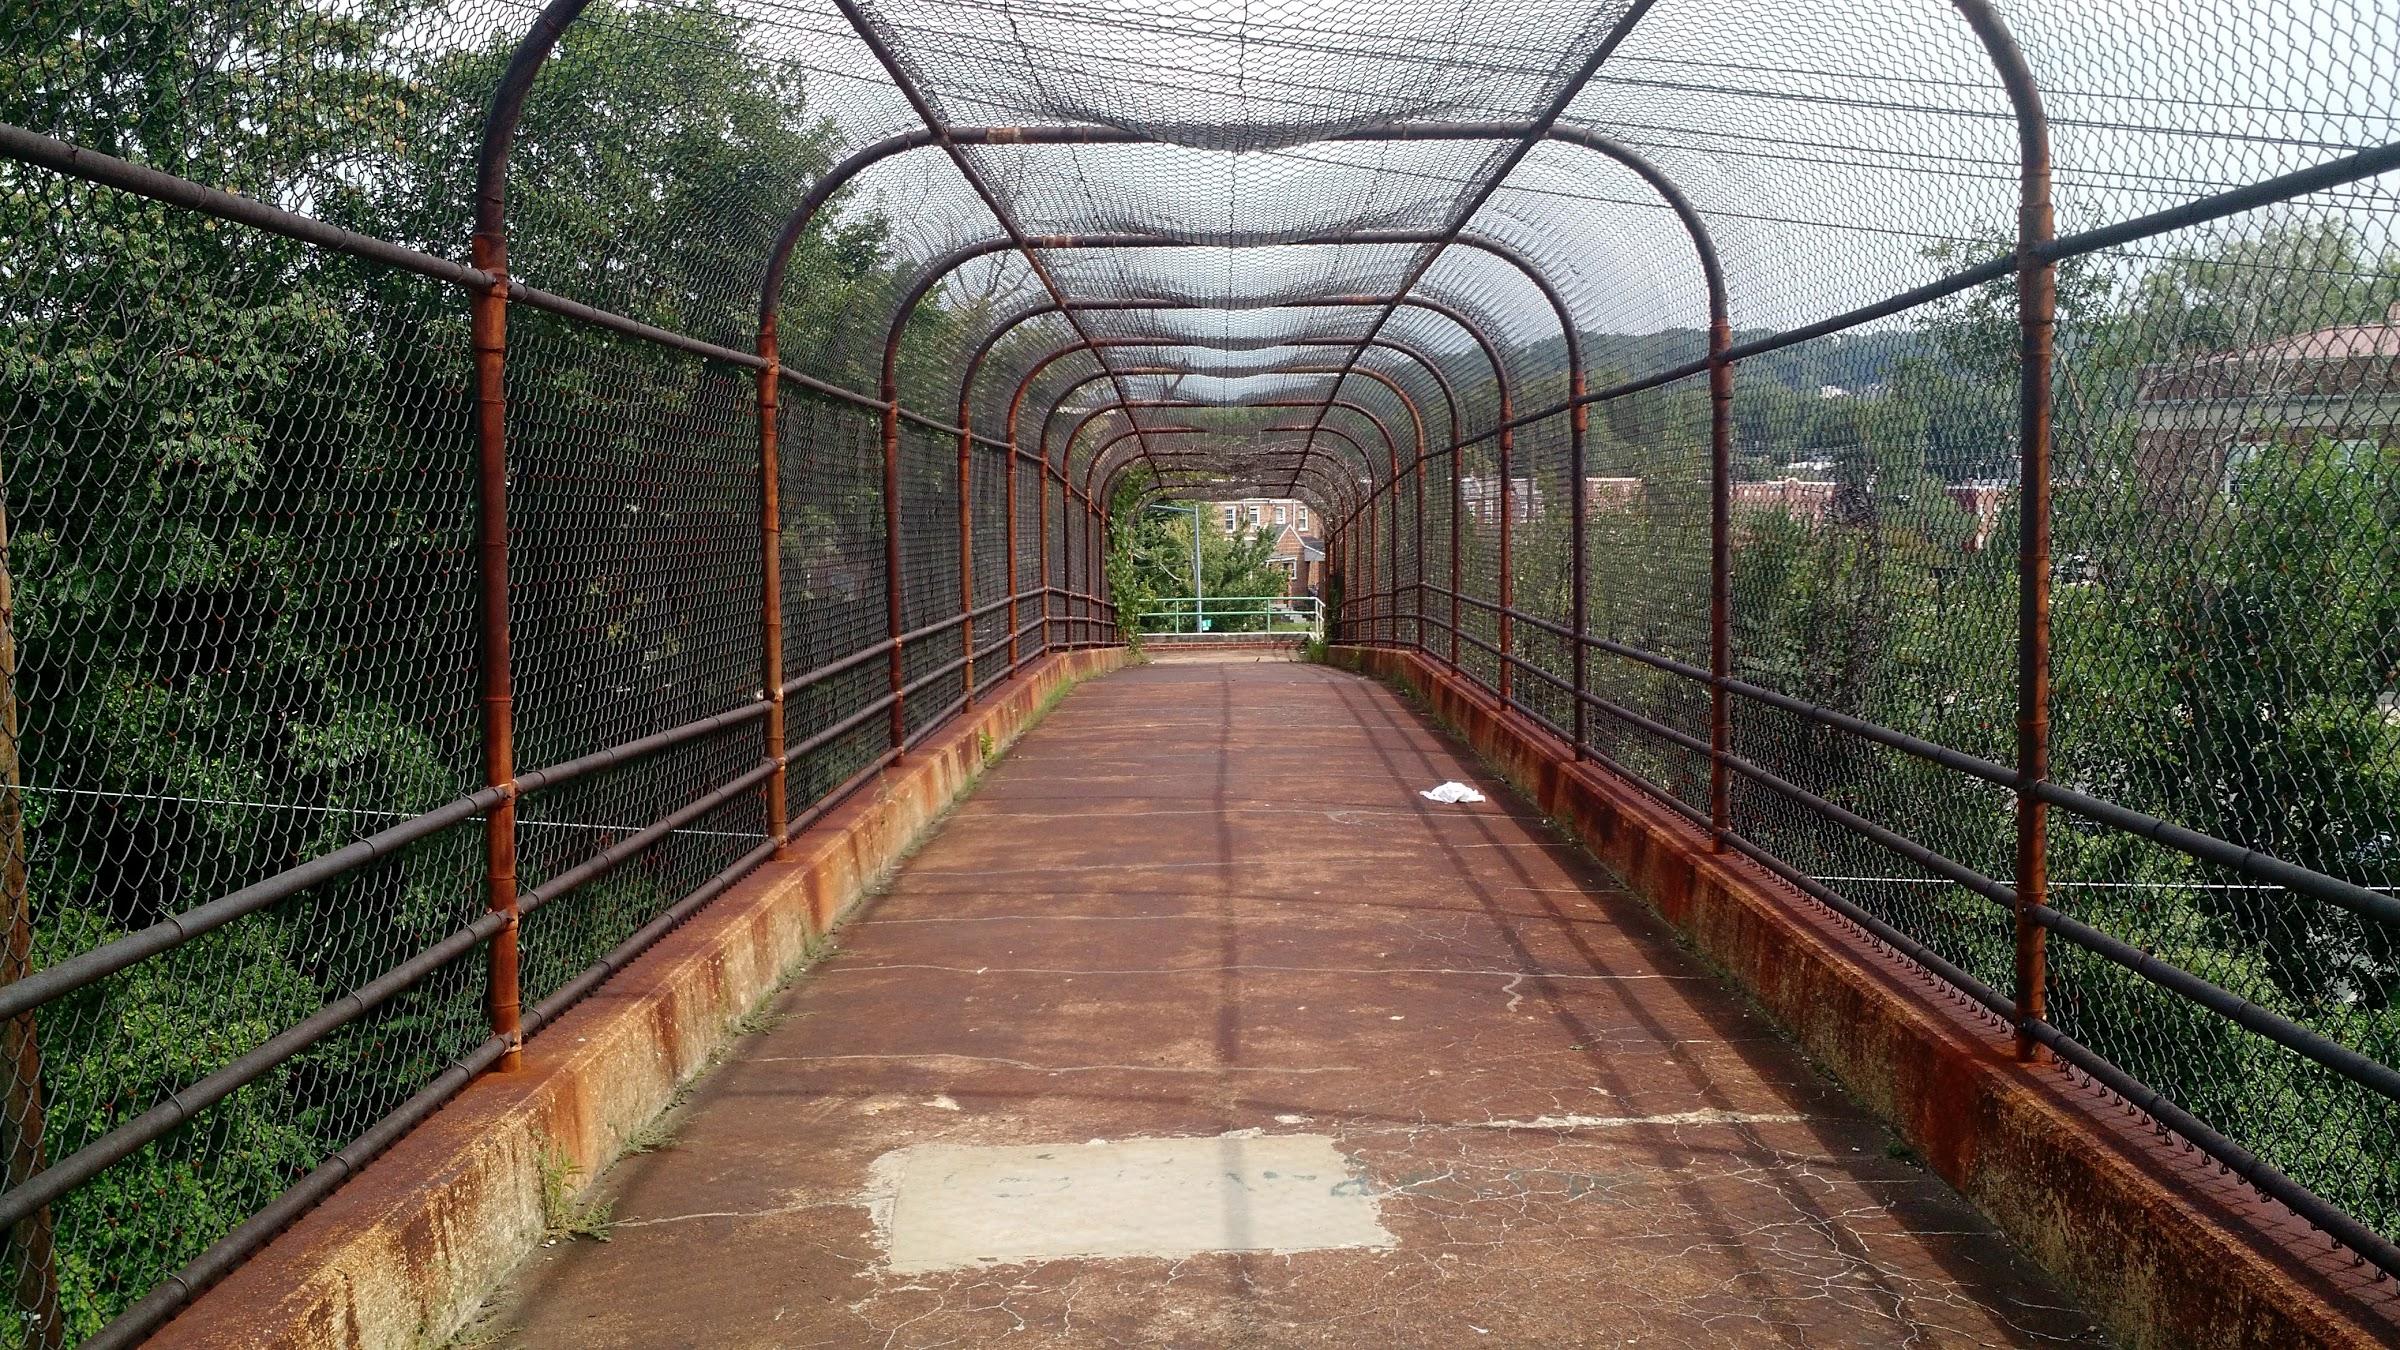 This is the pedestrian bridge between the neighborhood around Anacostia High School and Anacostia Park, over Highway 295.